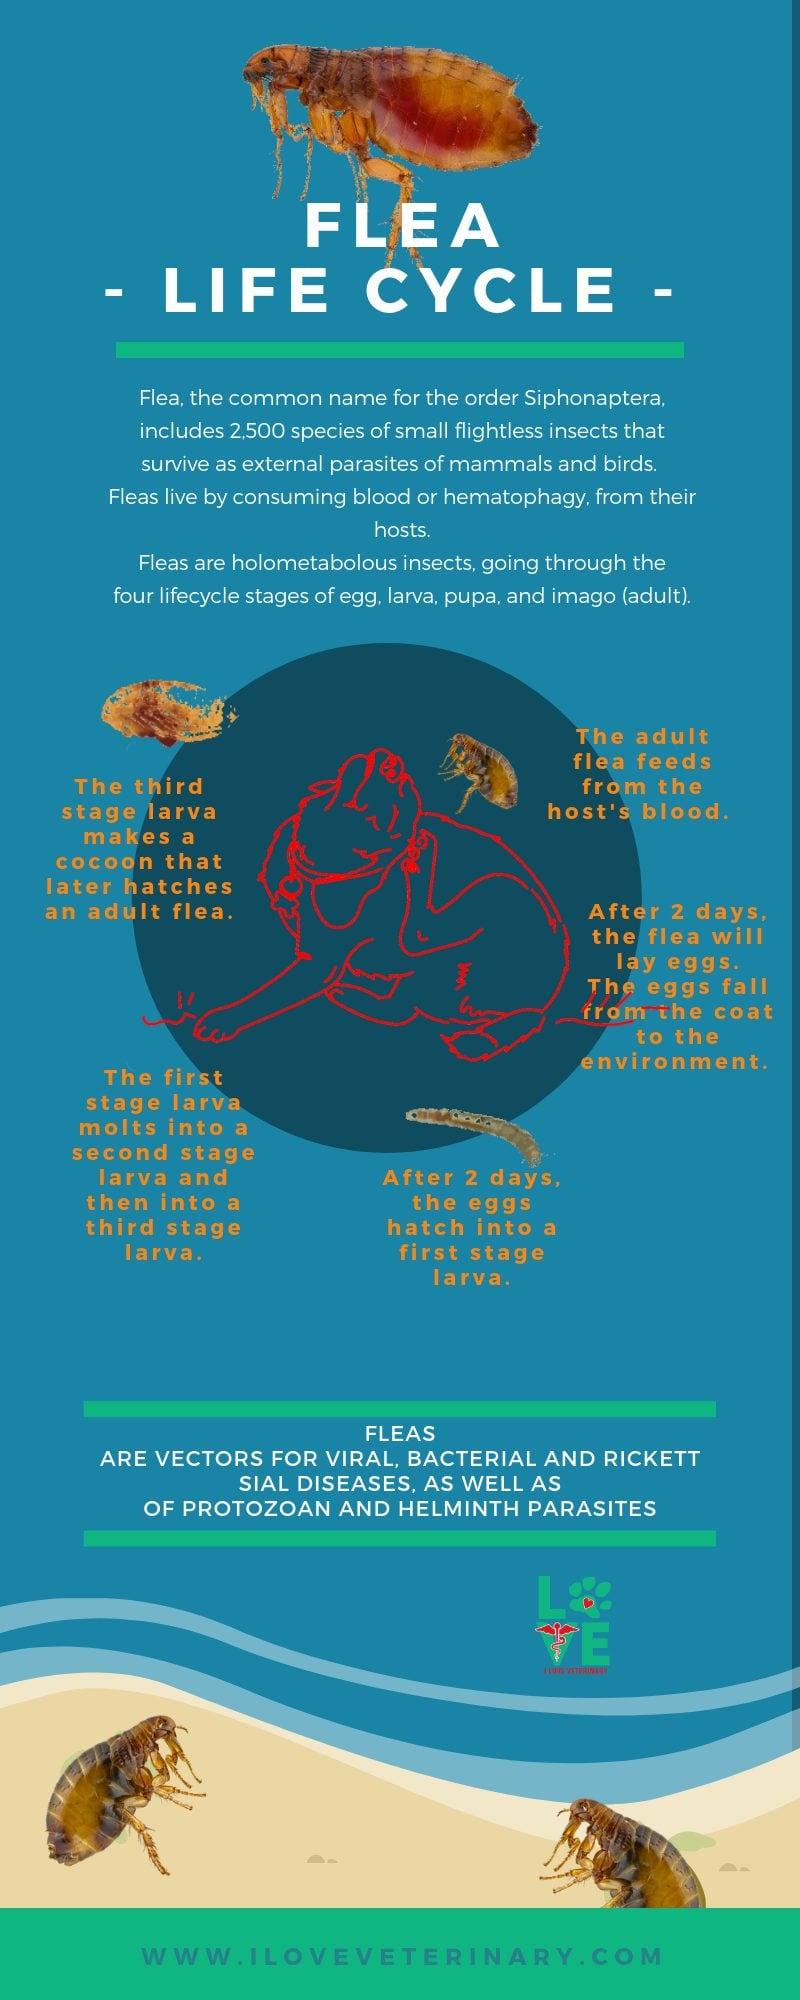 FLEA LIFE CYCLE I Love Veterinary - Blog for Veterinarians, Vet Techs, Students